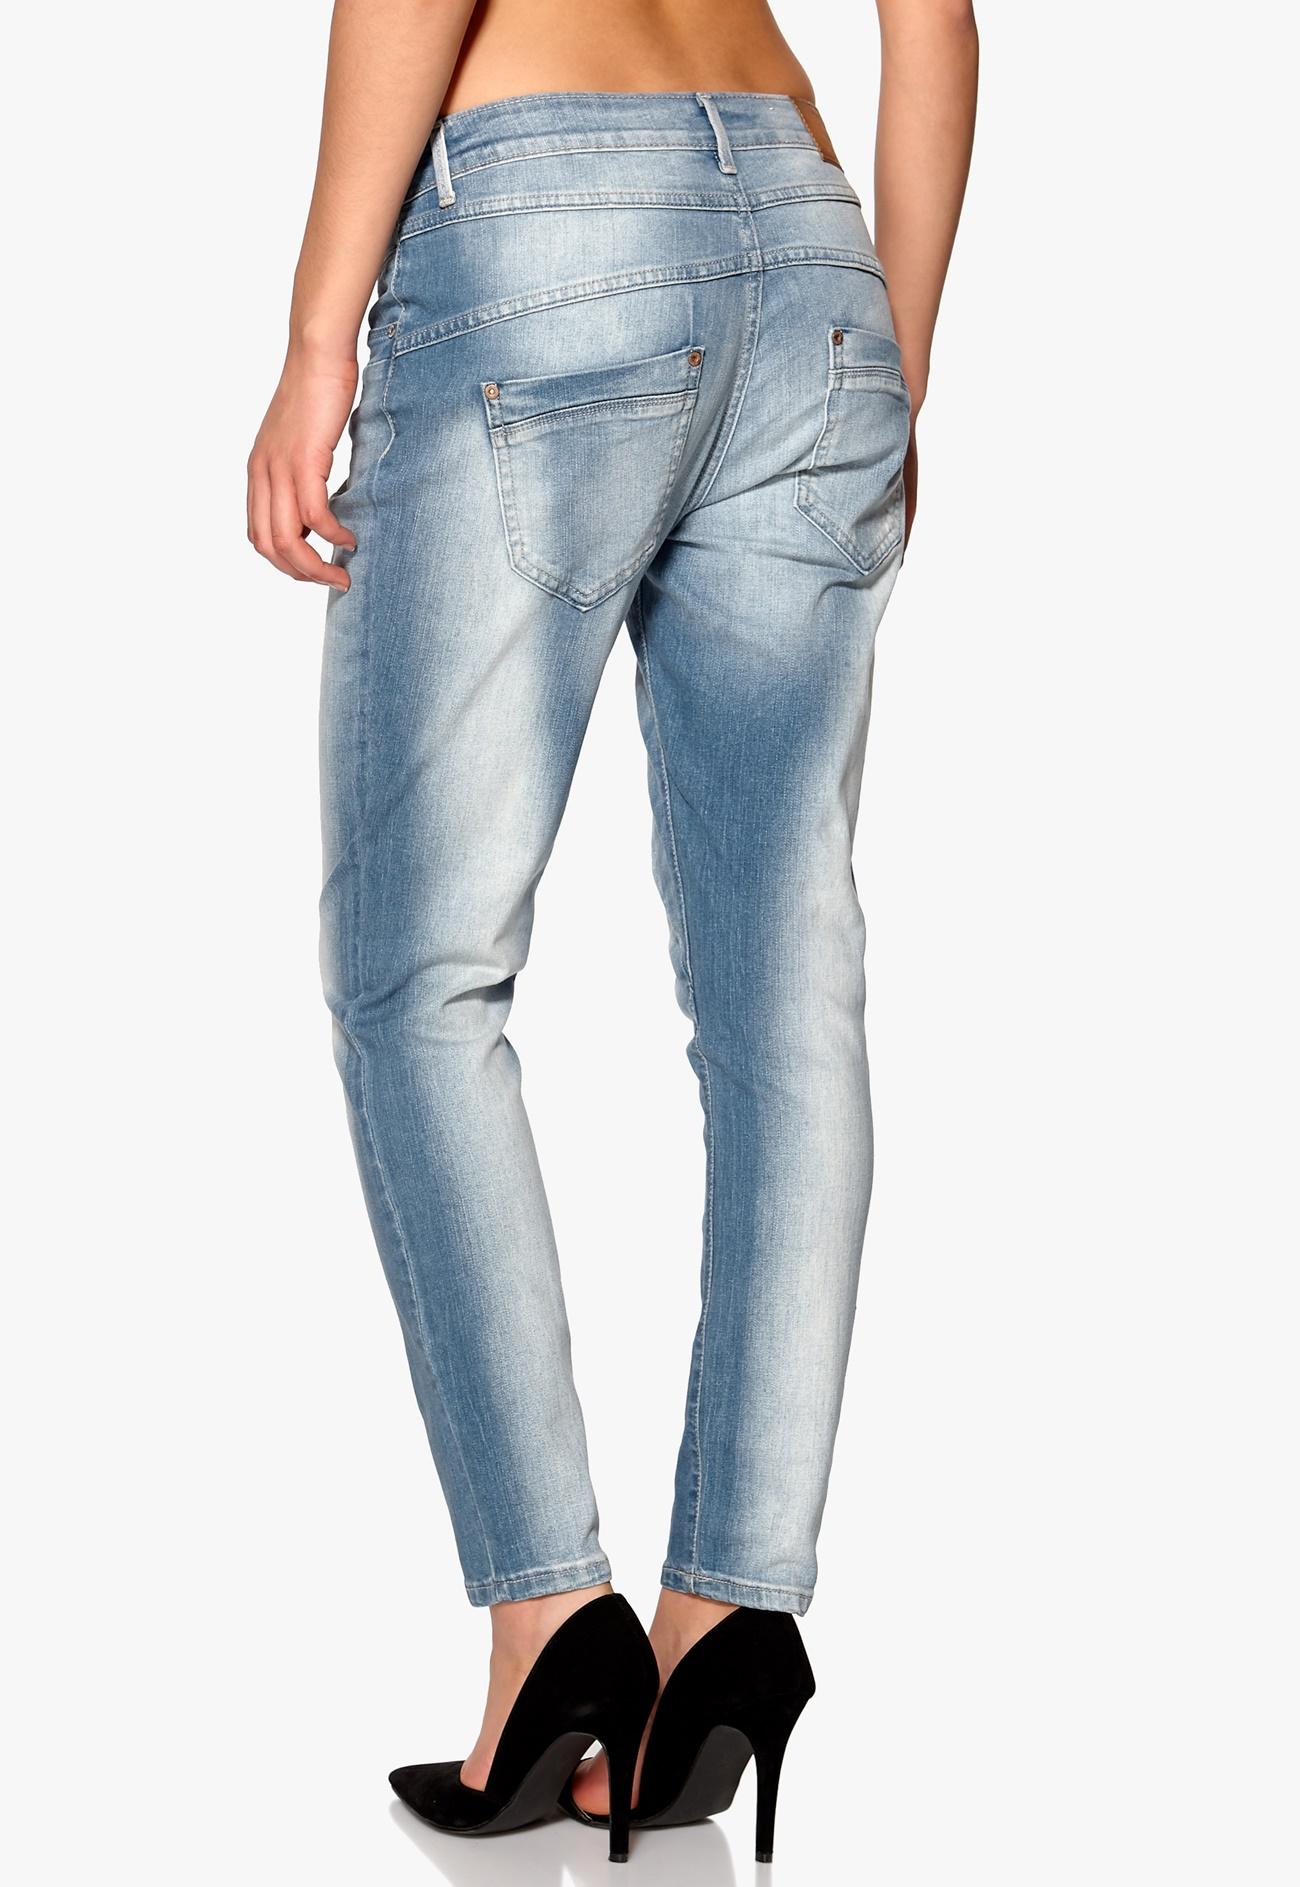 ONLY Lizzy Antifit Jeans Light Blue Denim  Bubbleroom